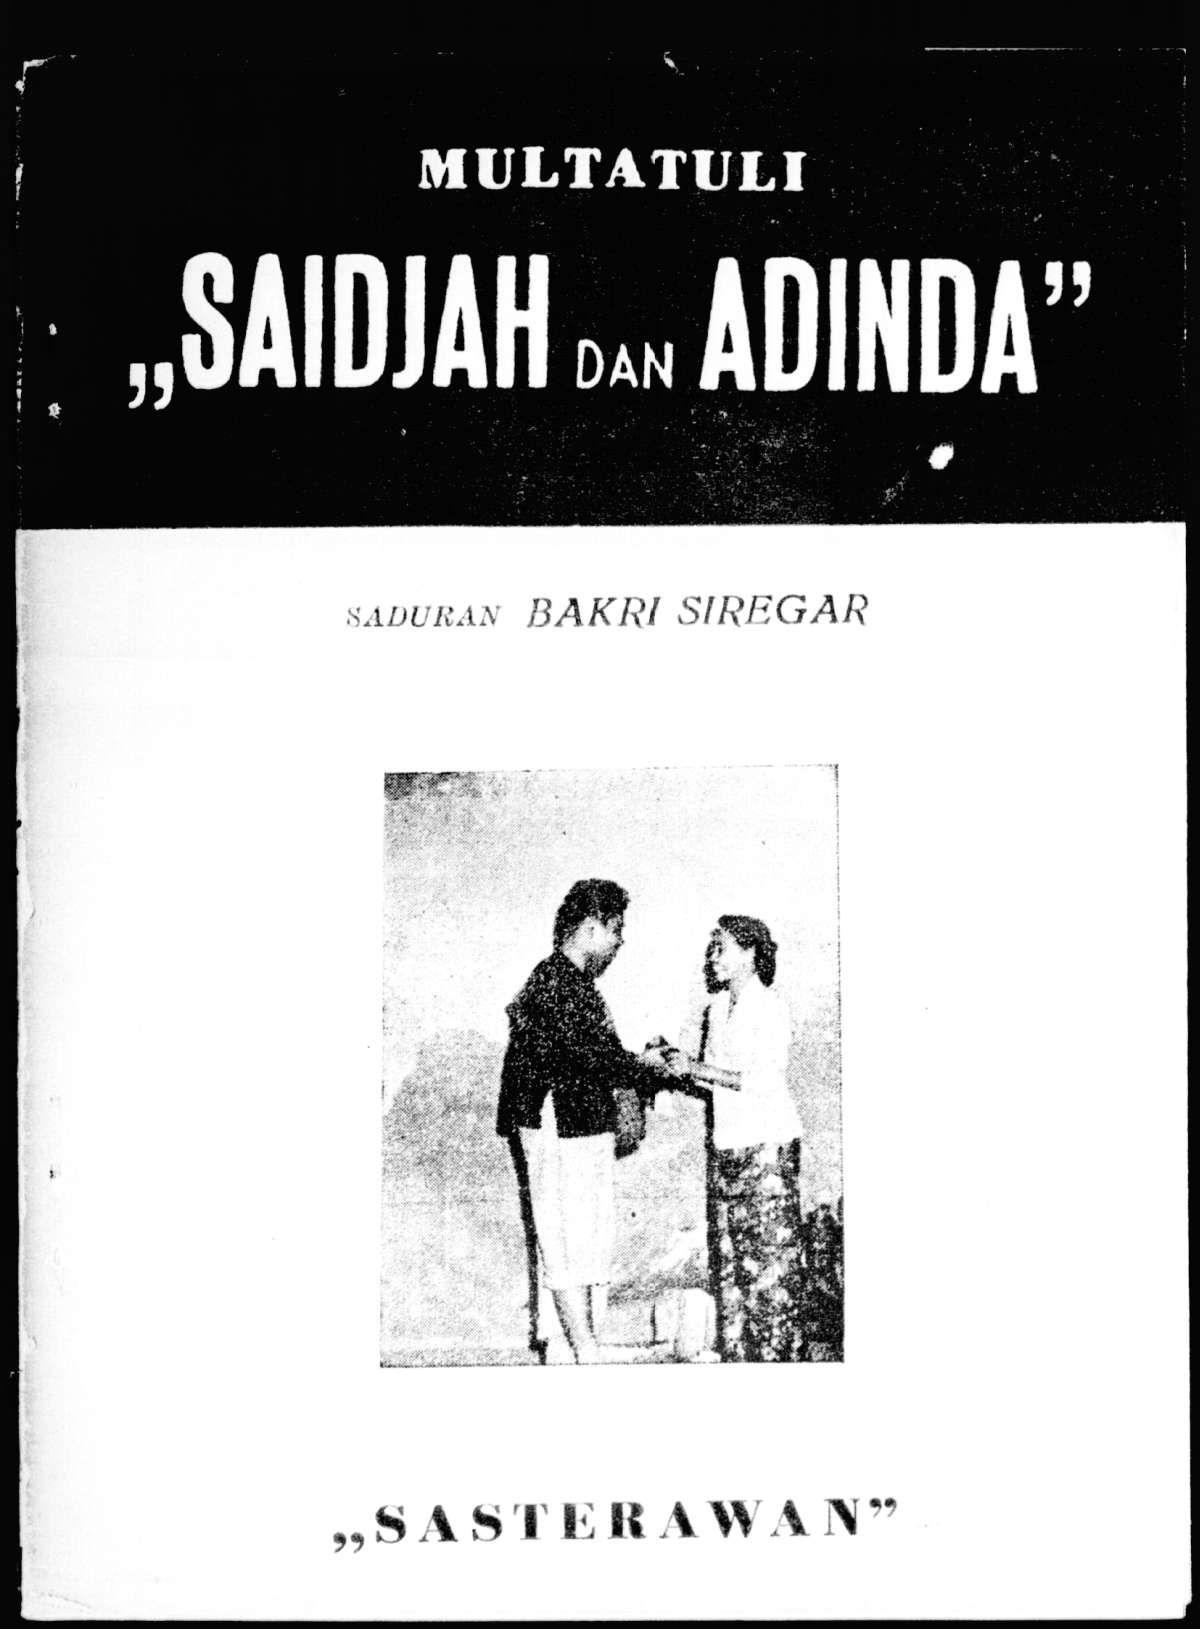 Saidjah dan Adinda, Lakon 3 babak saduran Bakri Siregar, Multatuli, Medan, 1954